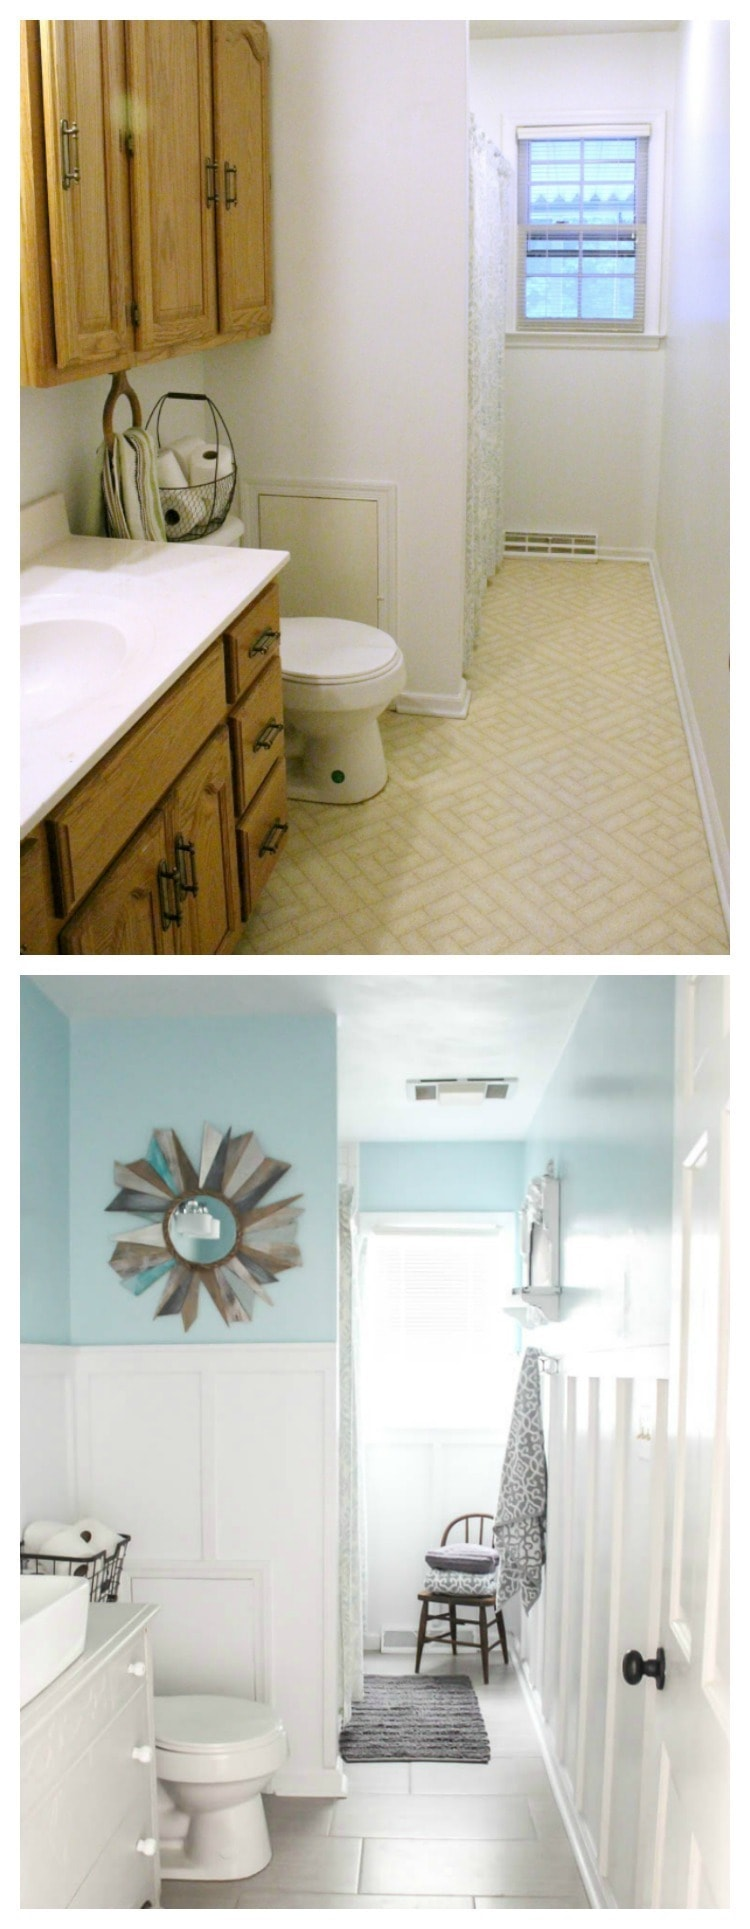 Modern Farmhouse Bathroom: The True Final Budget and ... on Modern Farmhouse Shower  id=63902